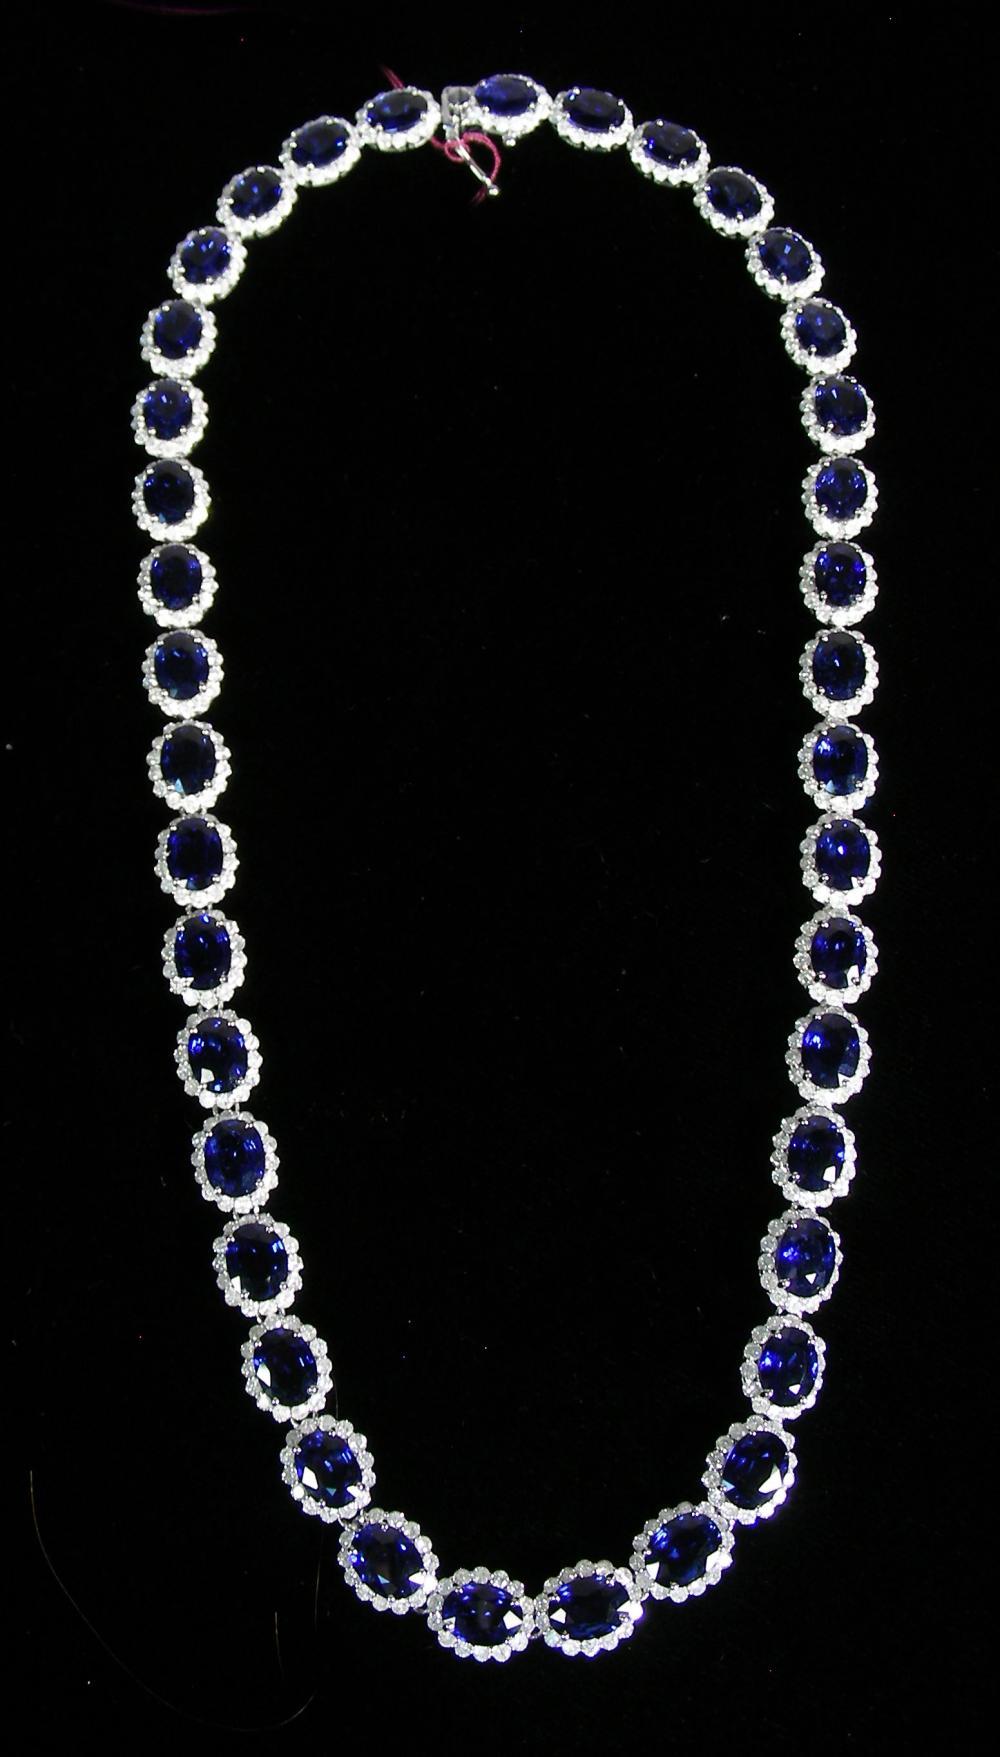 LADIES 14K WHITE GOLD, SAPPHIRE & DIAMOND ETERNITY NECKLACE